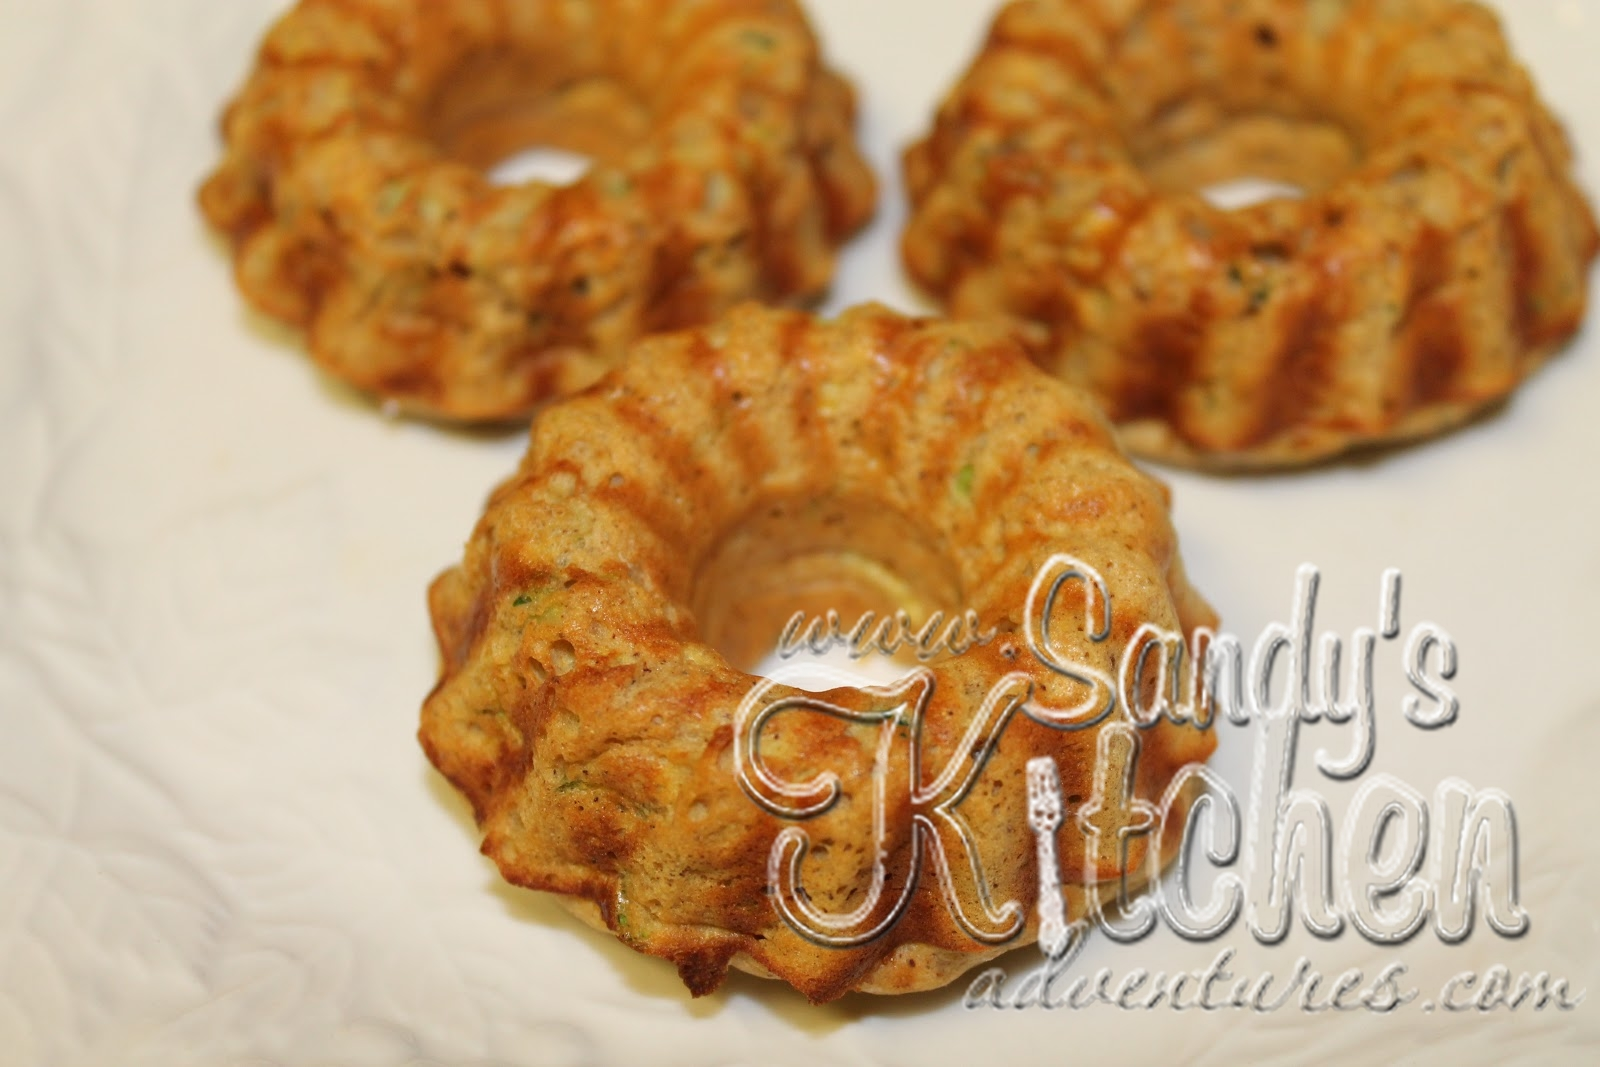 Sandys Kitchen Medifast Recipes Dandk Organizer